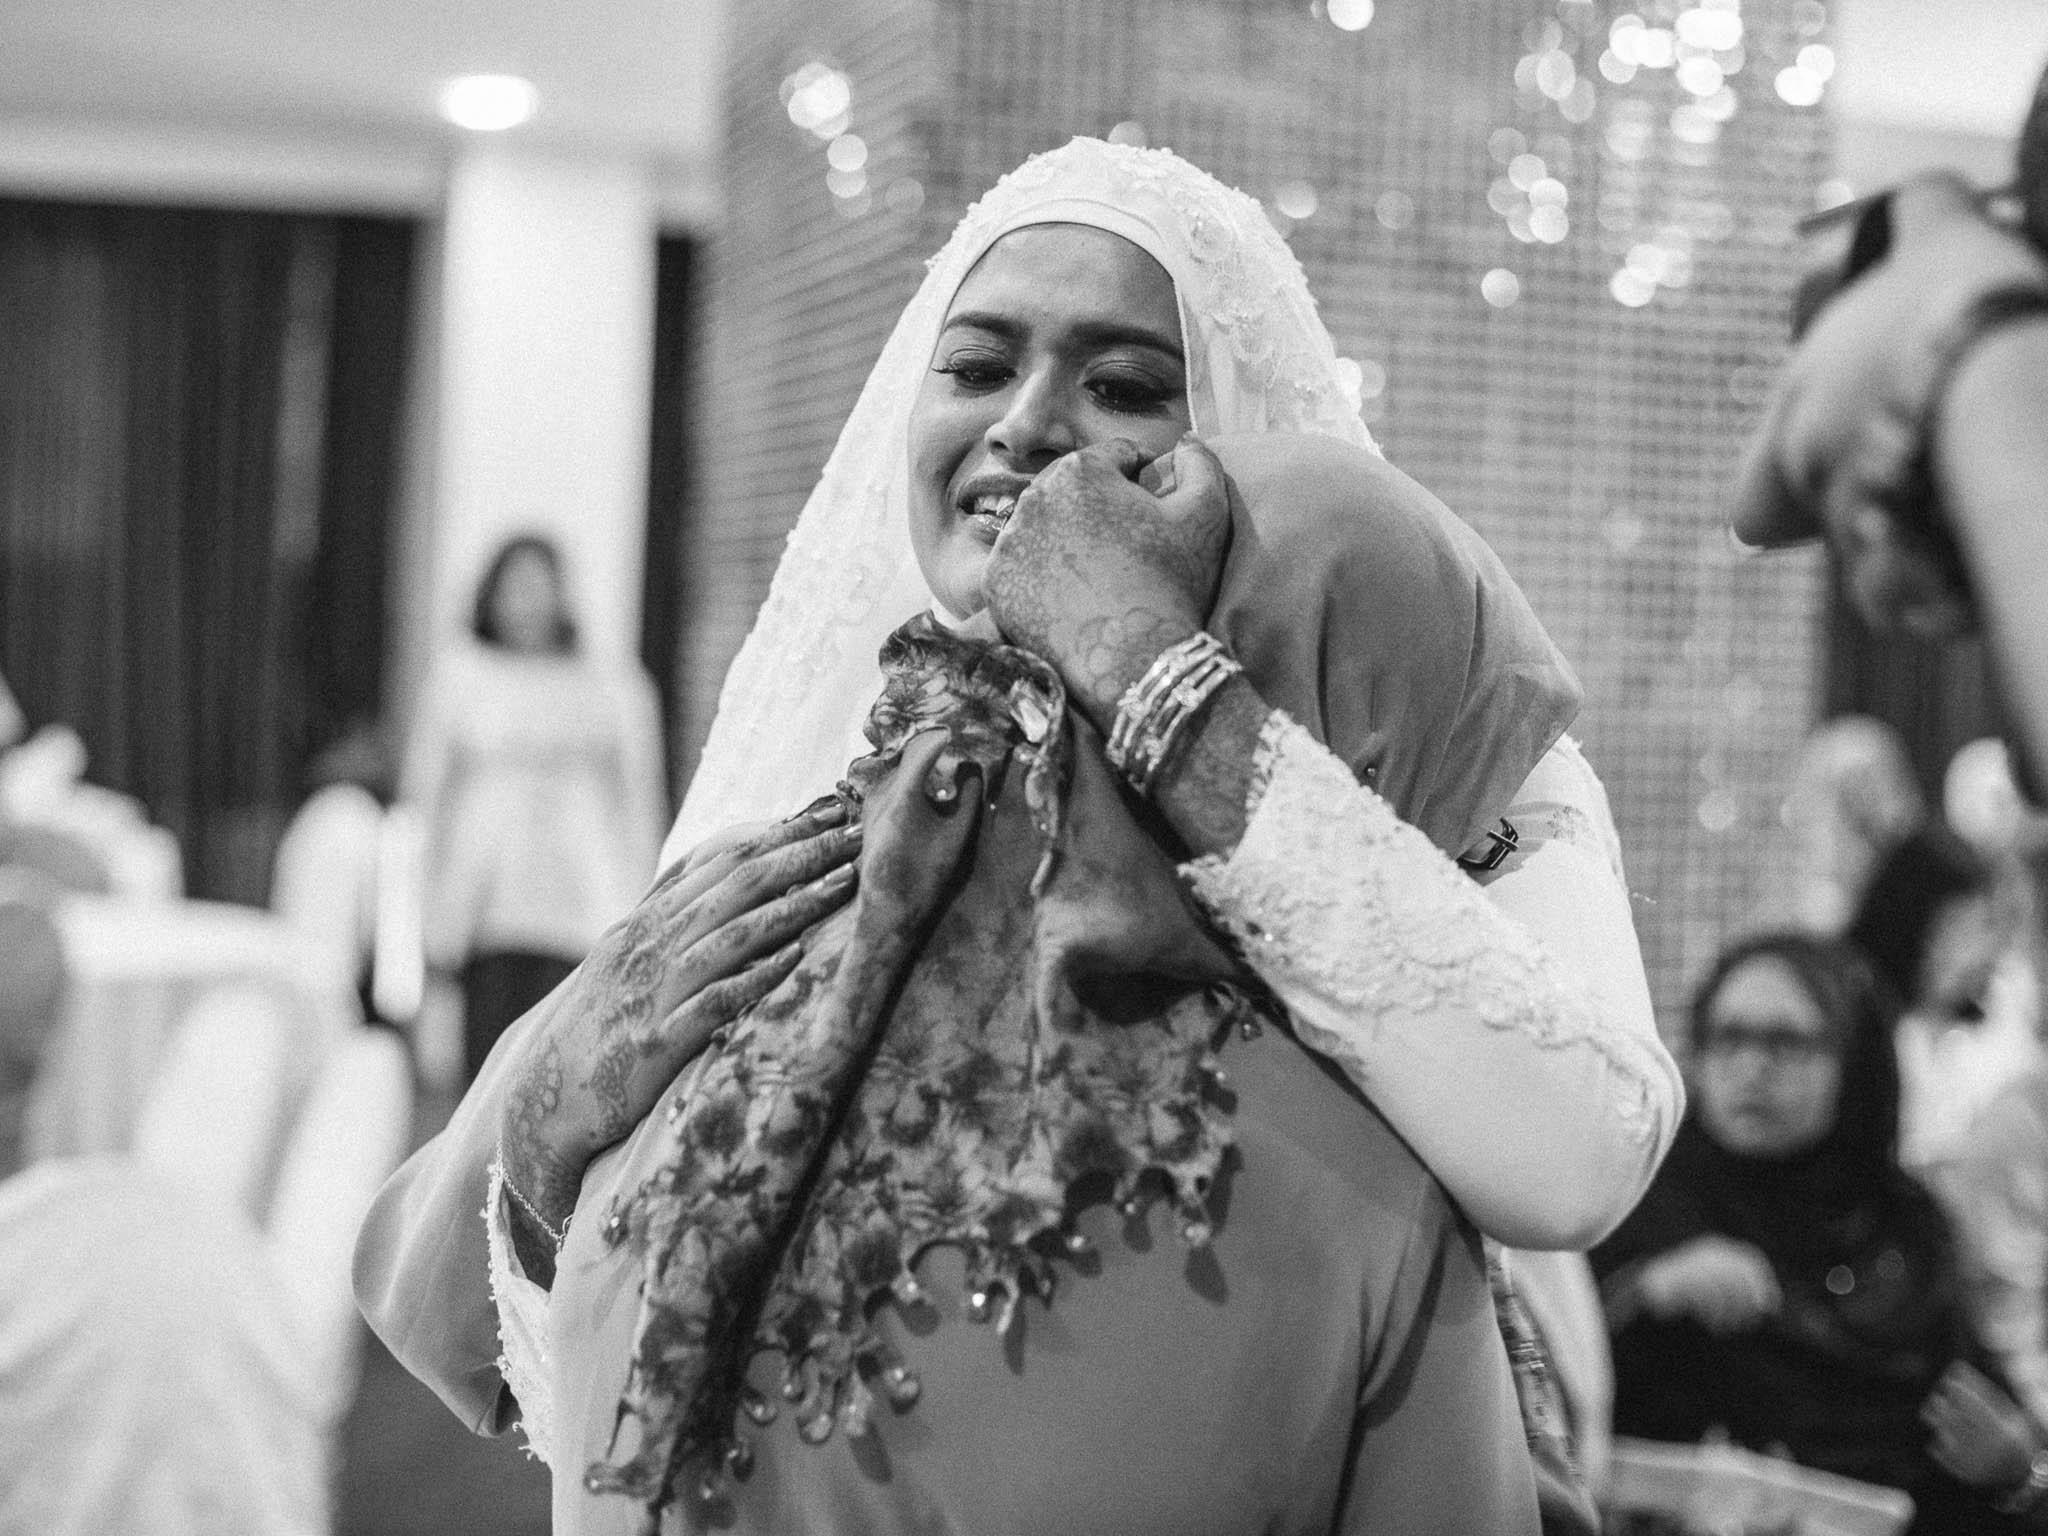 singapore-wedding-photographer-malay-indian-pre-wedding-travel-wmt-2015-28.jpg